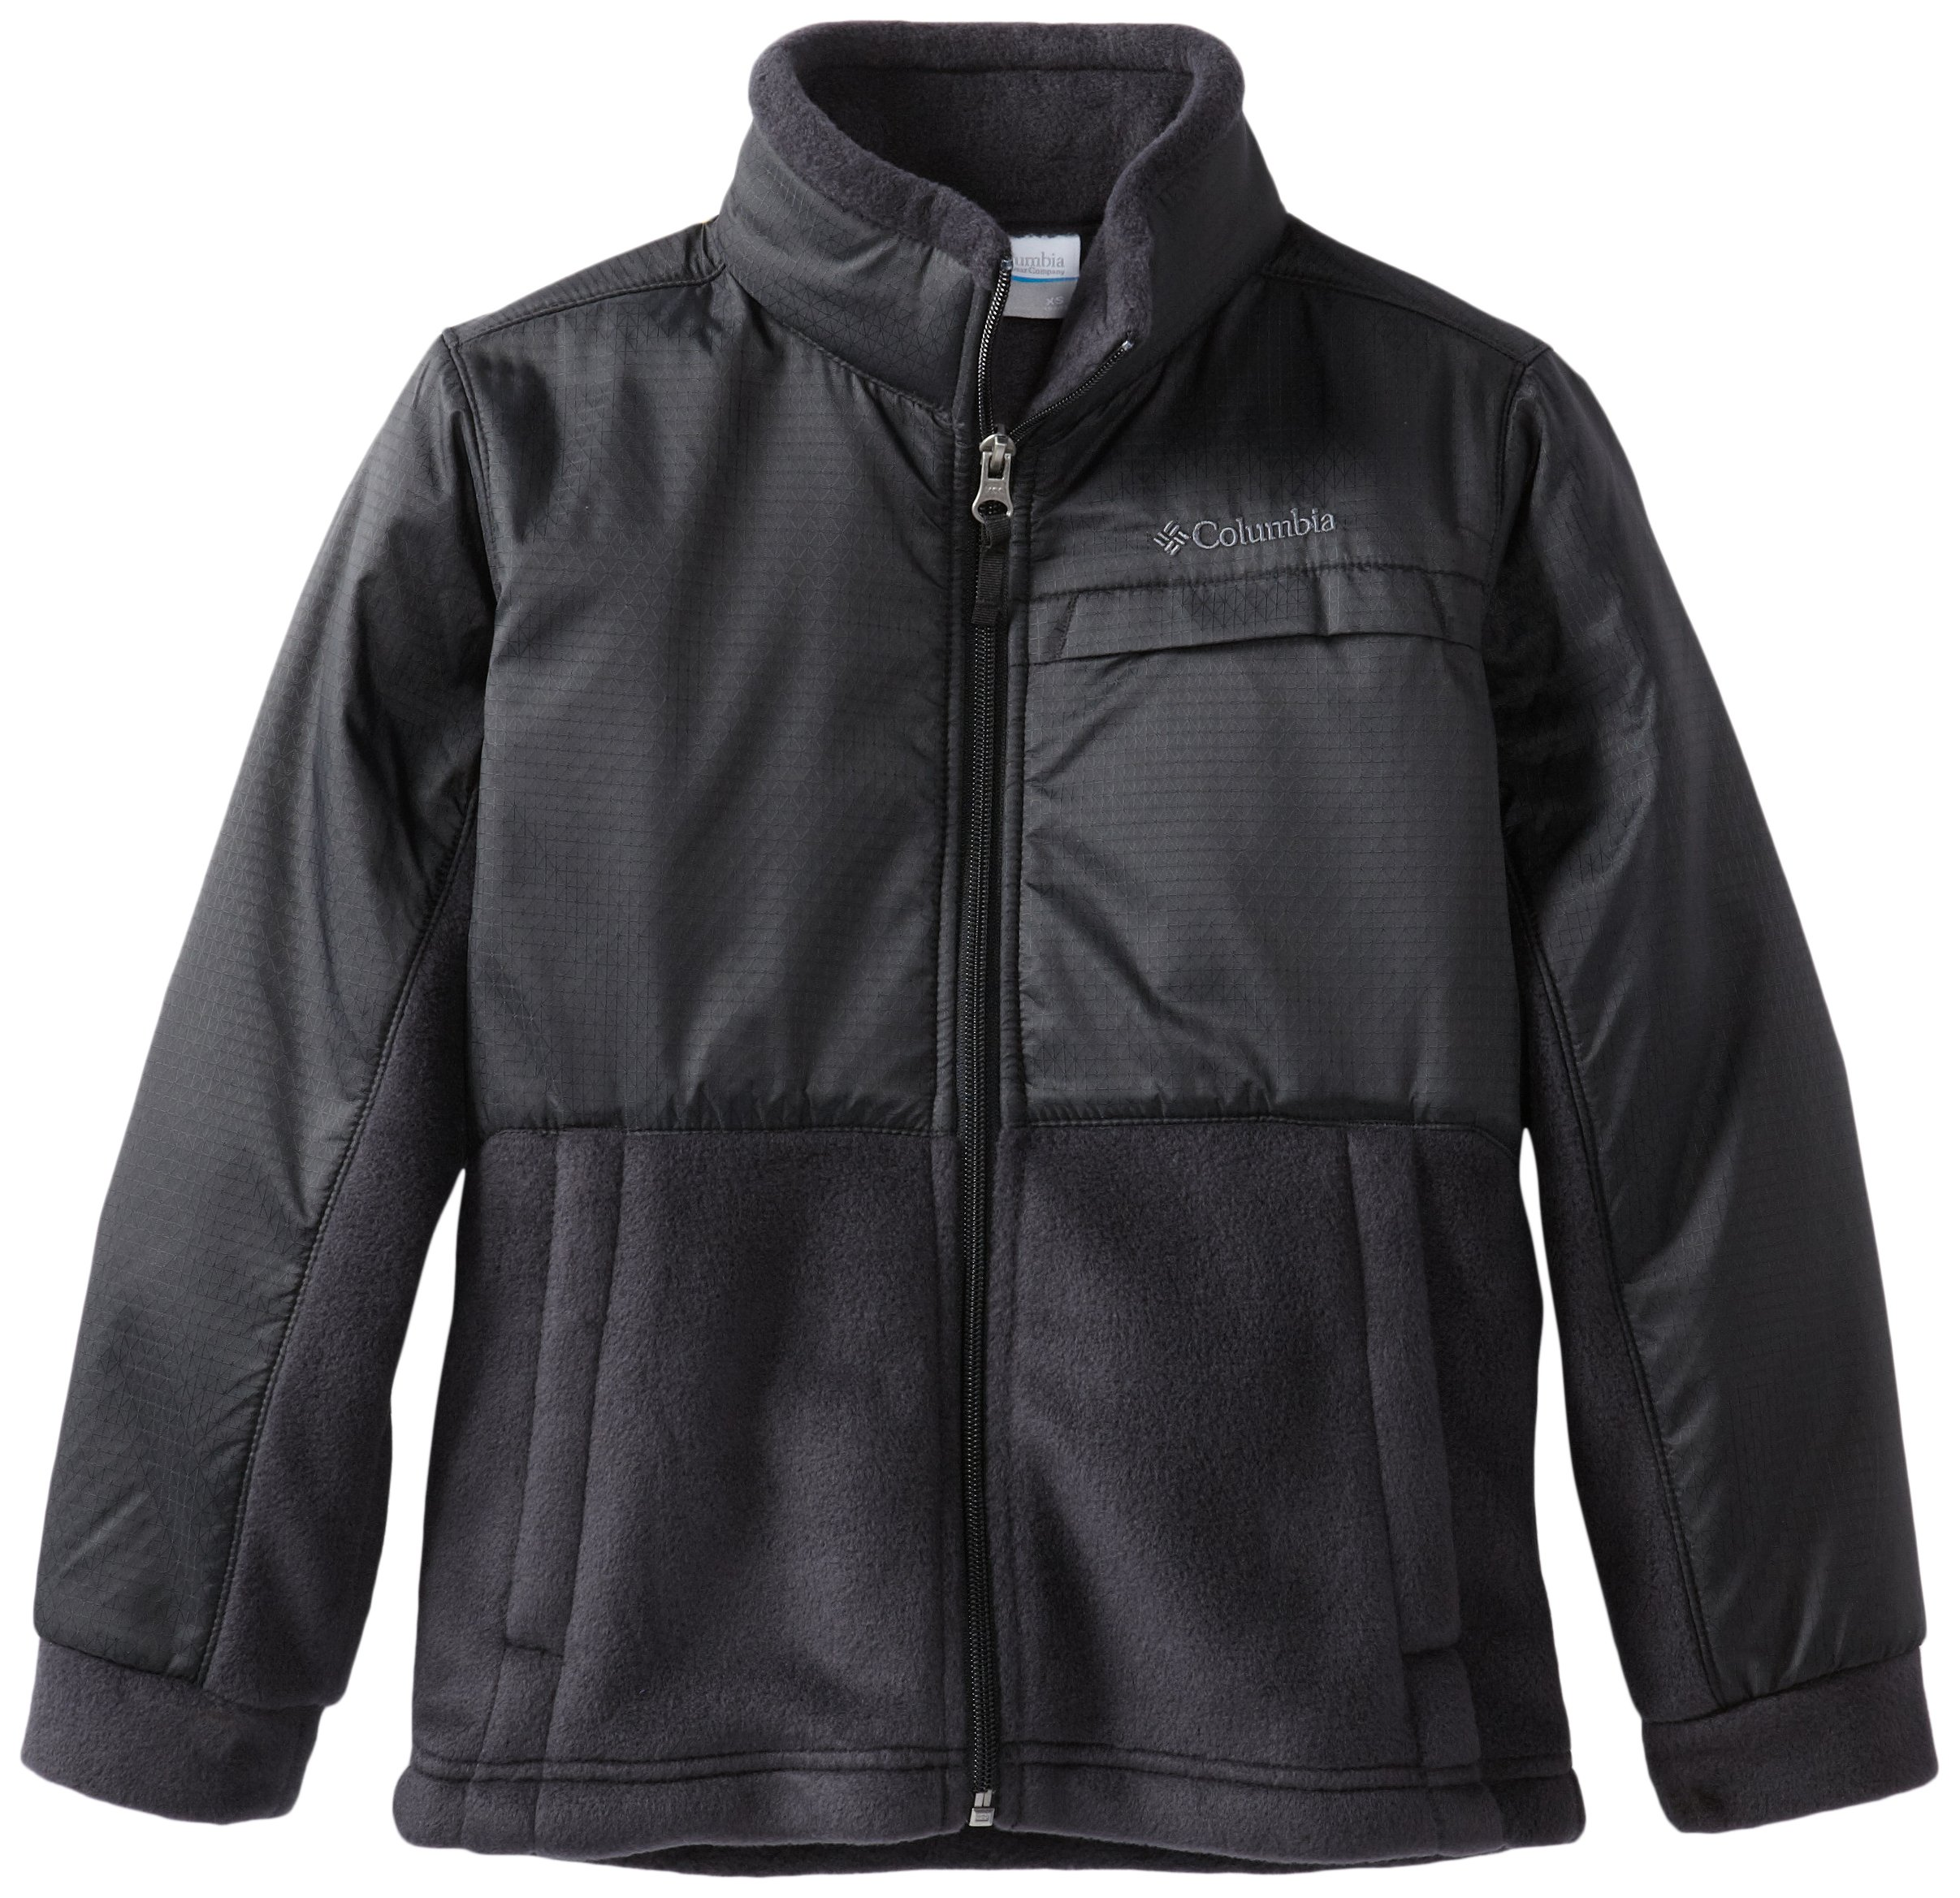 Columbia Little Boys' Steens MT Overlay Fleece Jacket, Black, X-Small (6/7)